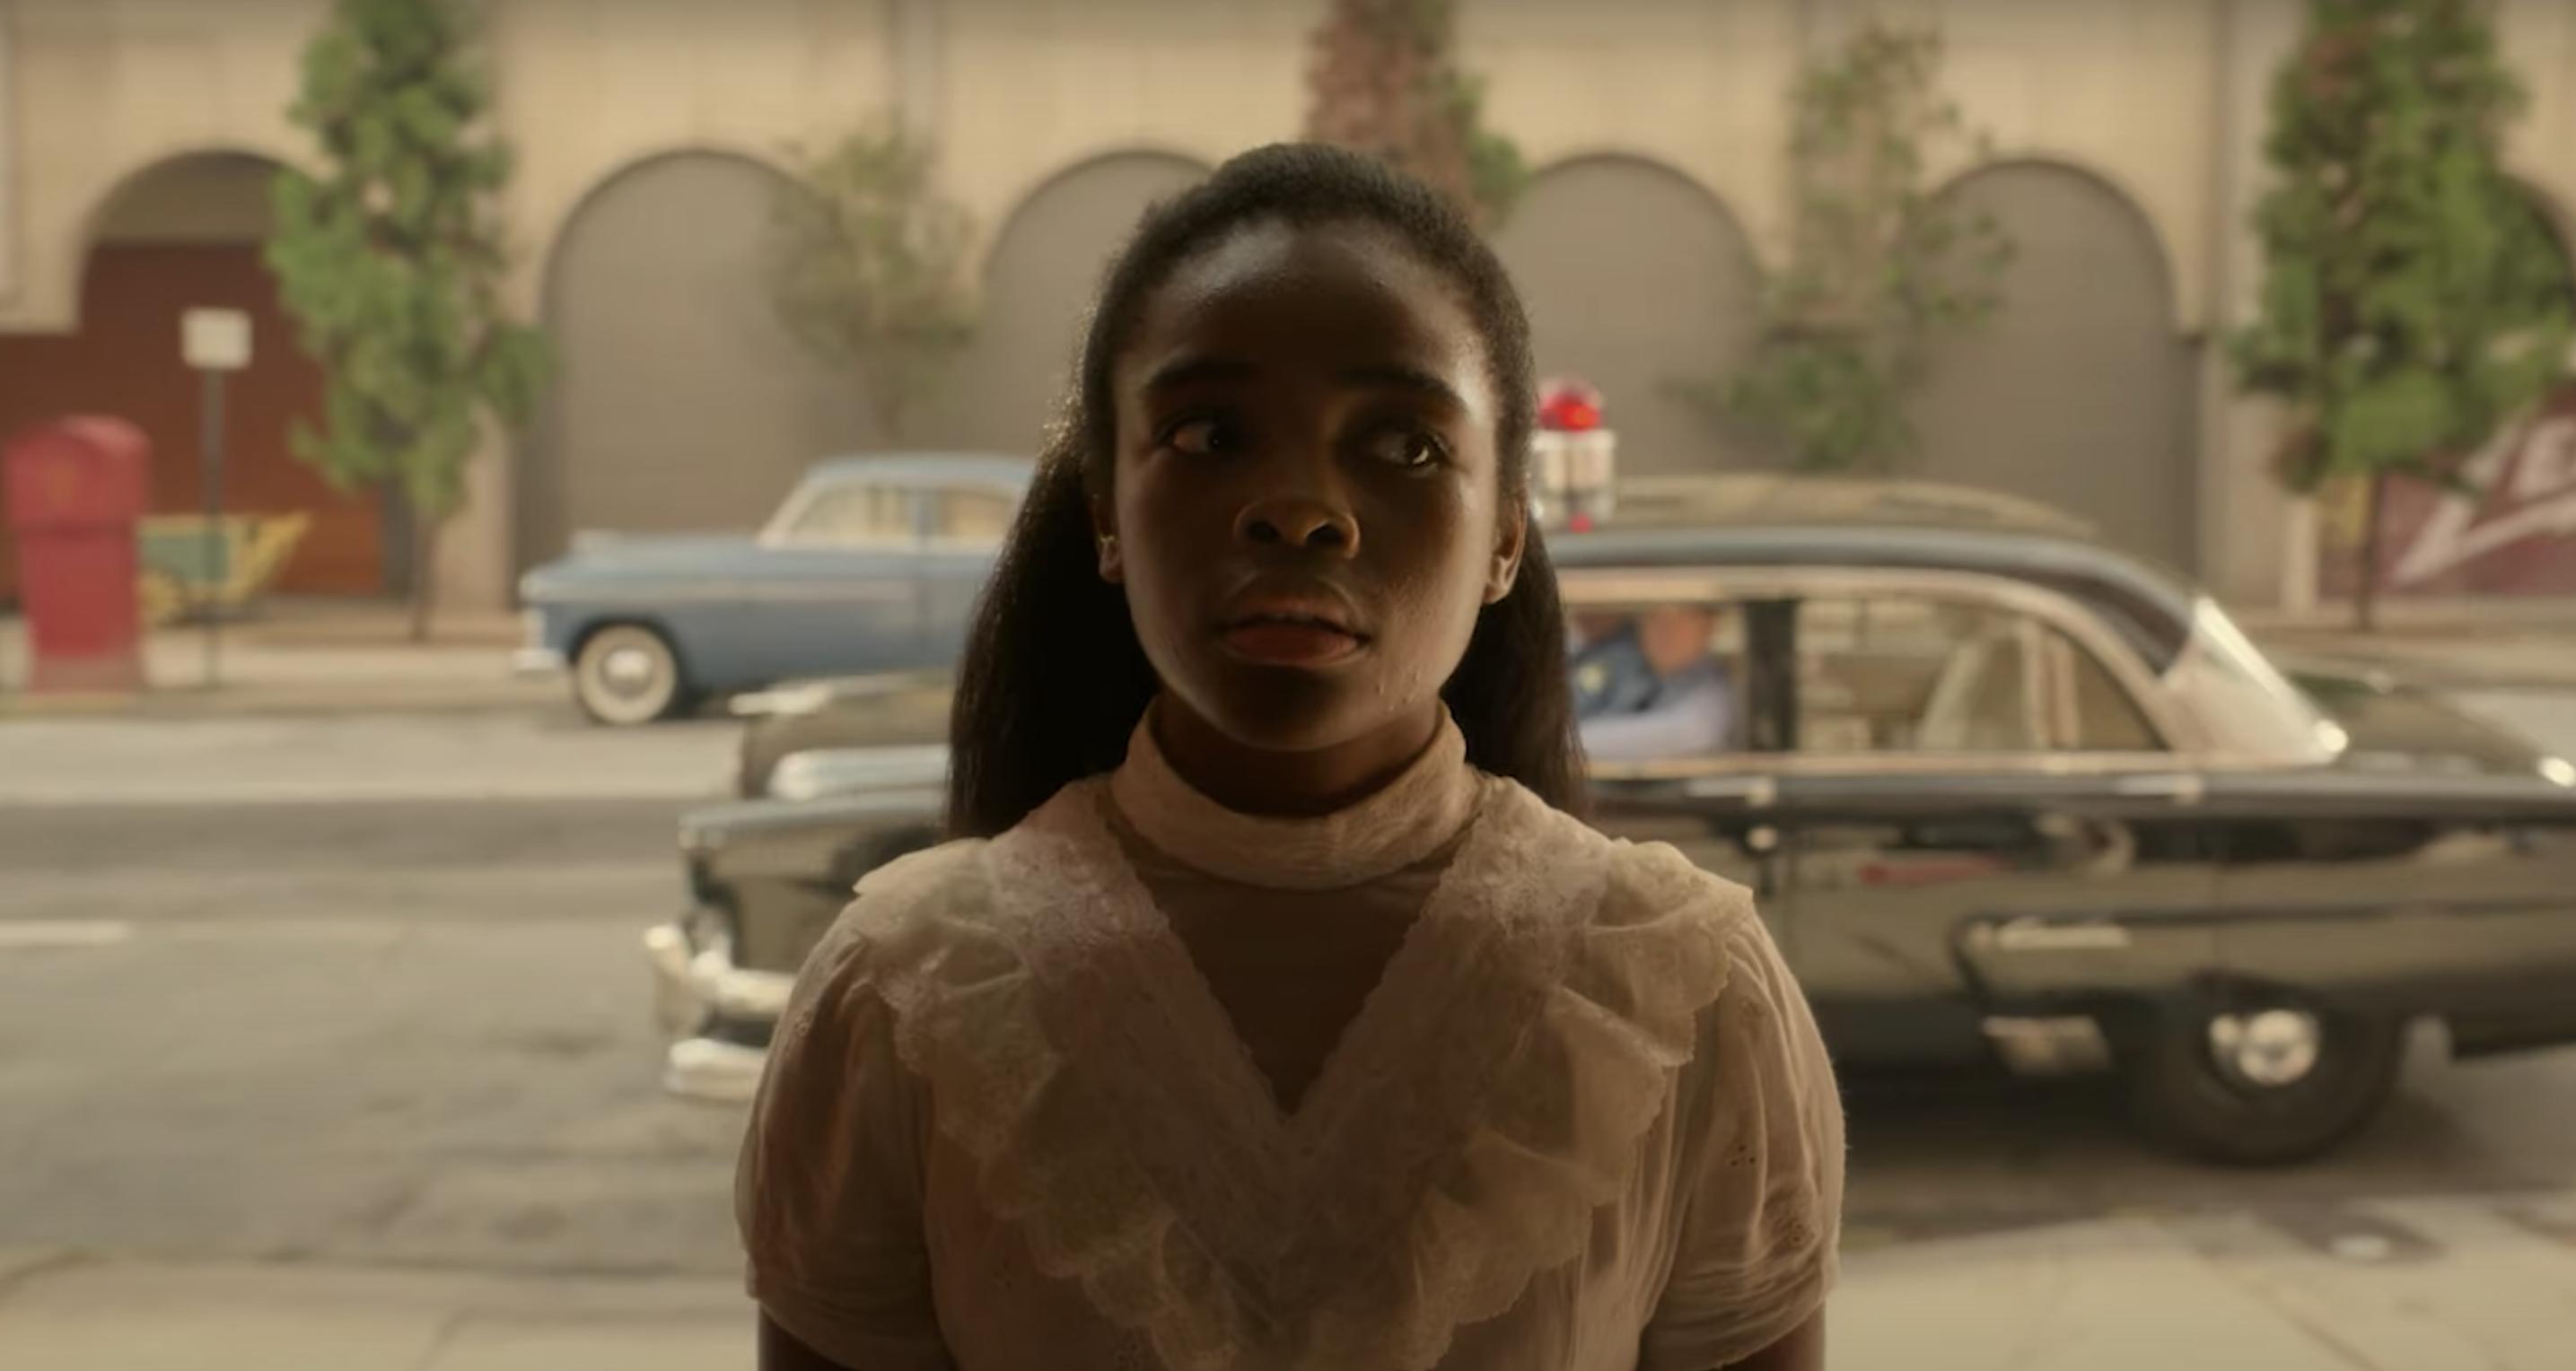 'Lovecraft Country' Trailer: Jordan Peele and J.J. Abrams Unleash HBO's Big Summer Series